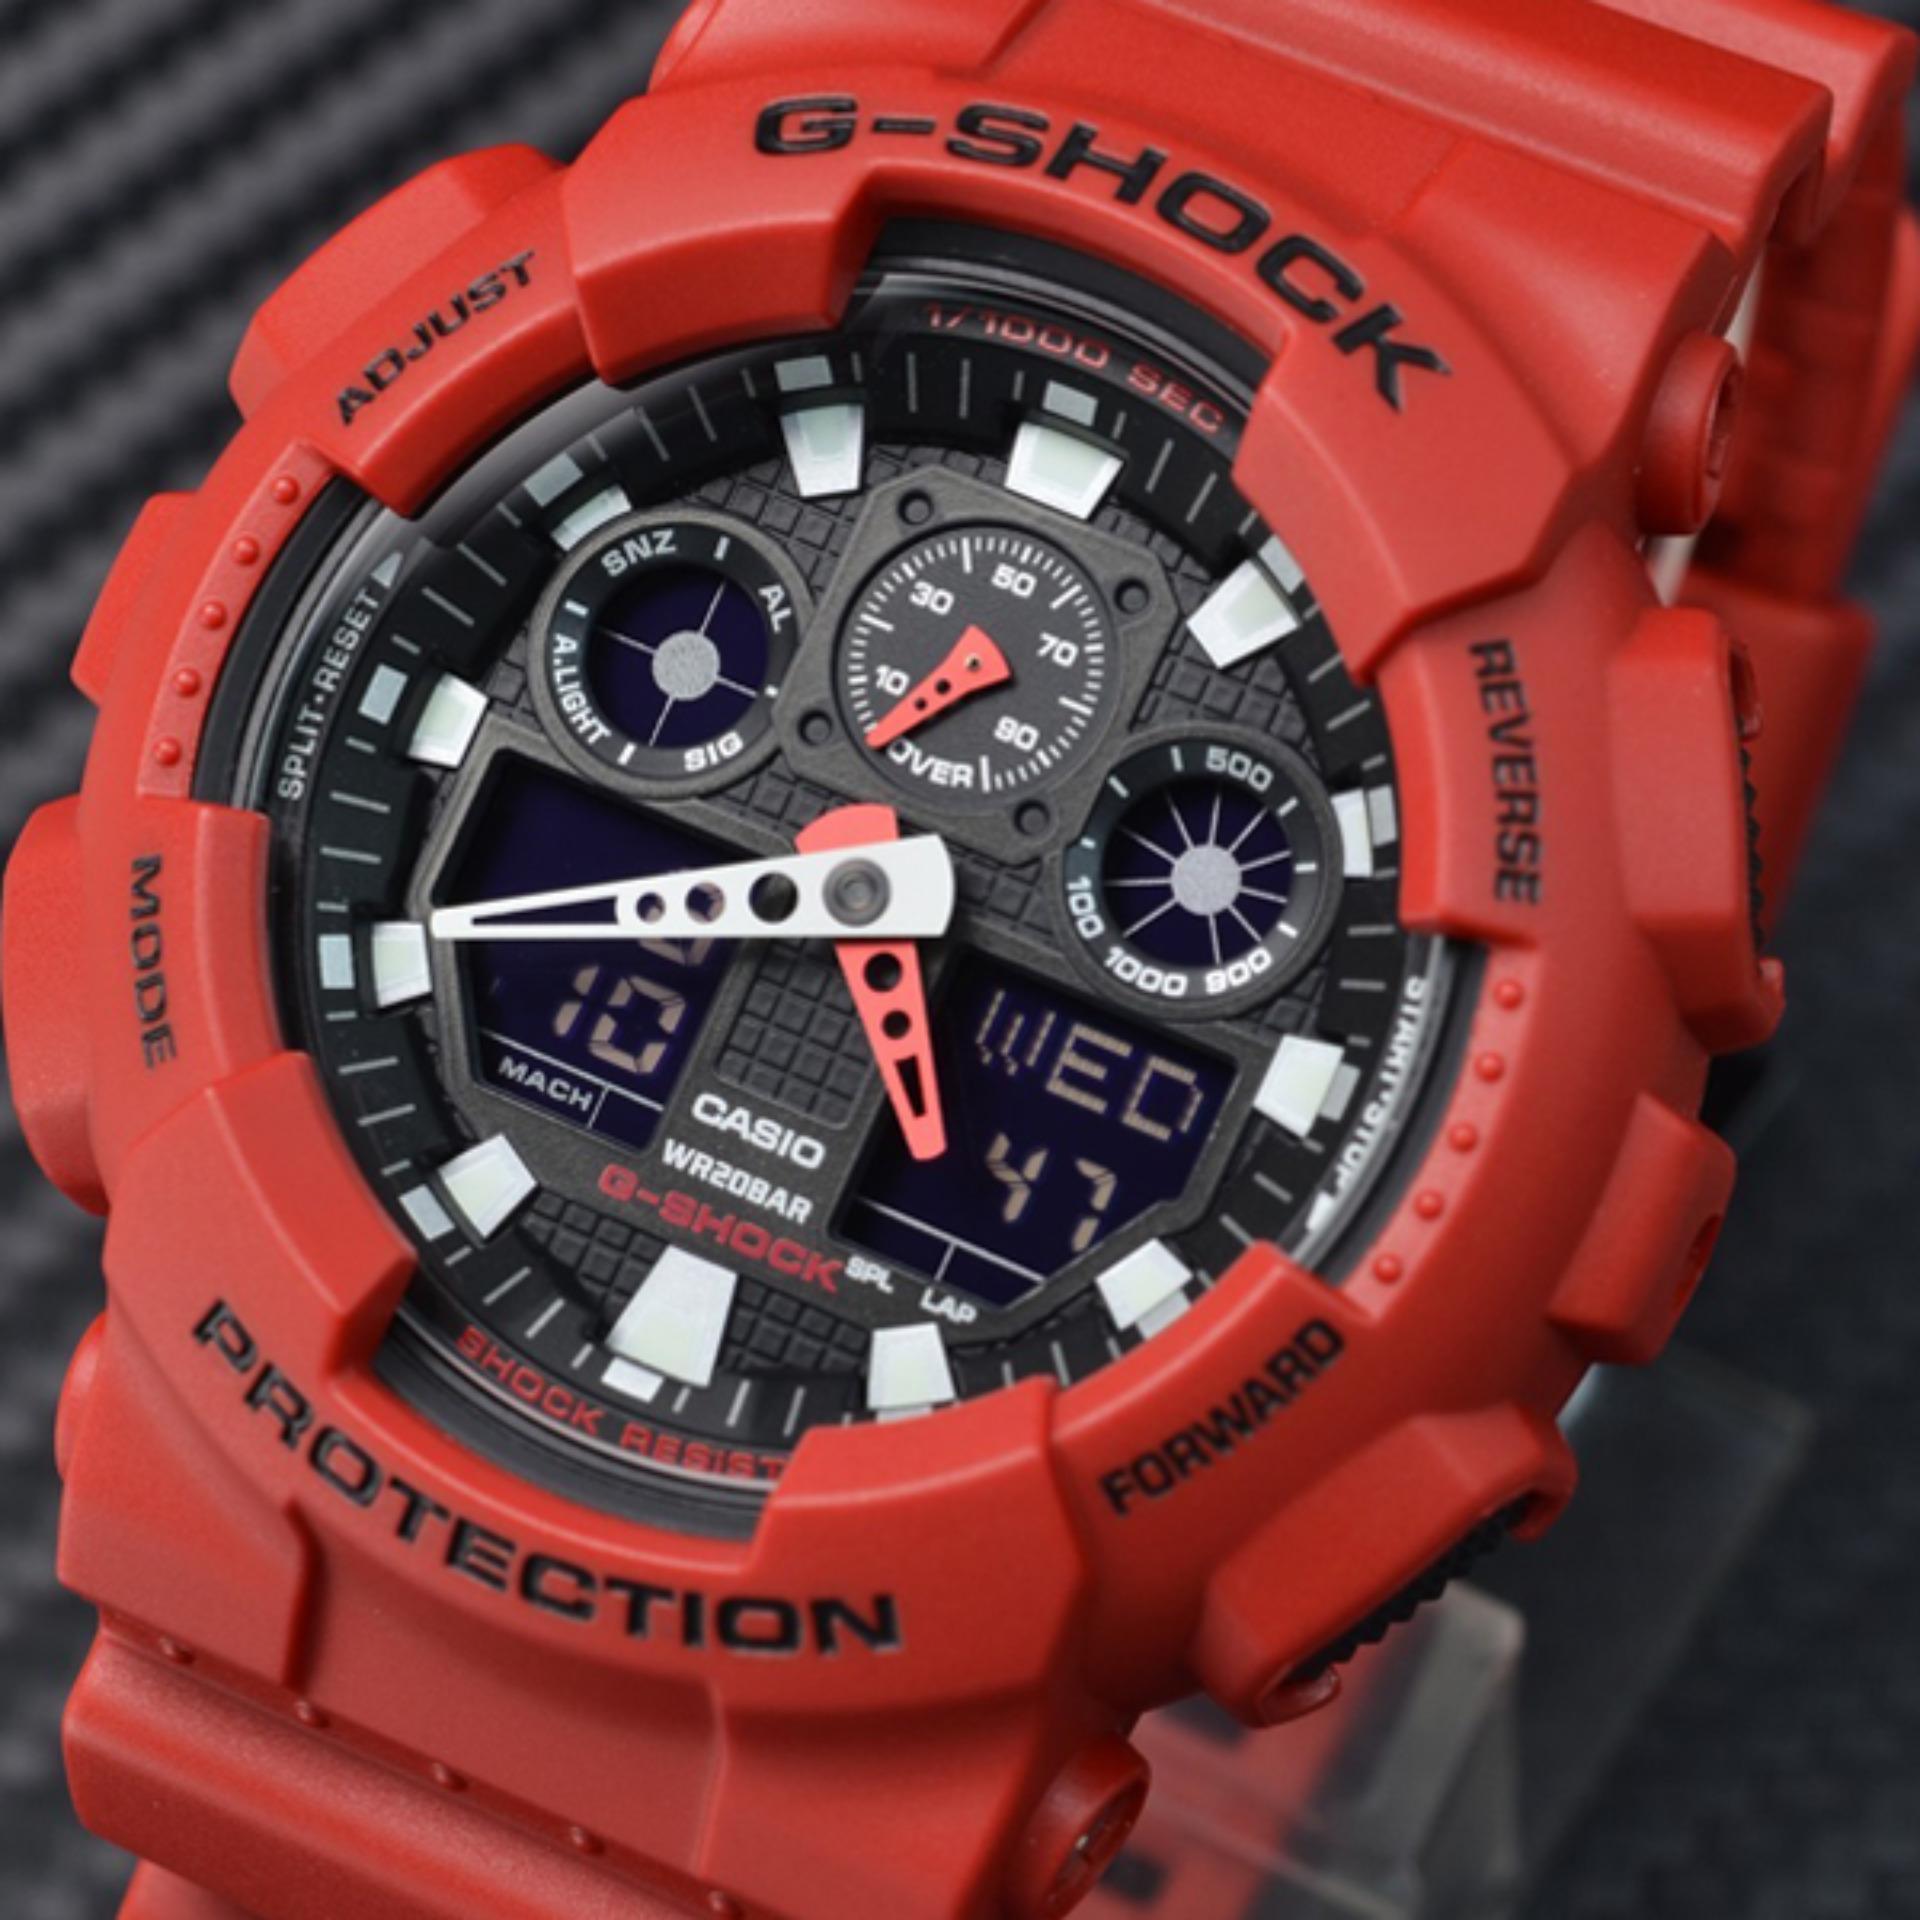 Casio G Shock Pria Hitam Damar Tali Jam Ga 1 100 9 Daftar Harga Gd 120mb 1dr Tangan Black Red Strap Resin Analog Digital 100b Series Karet